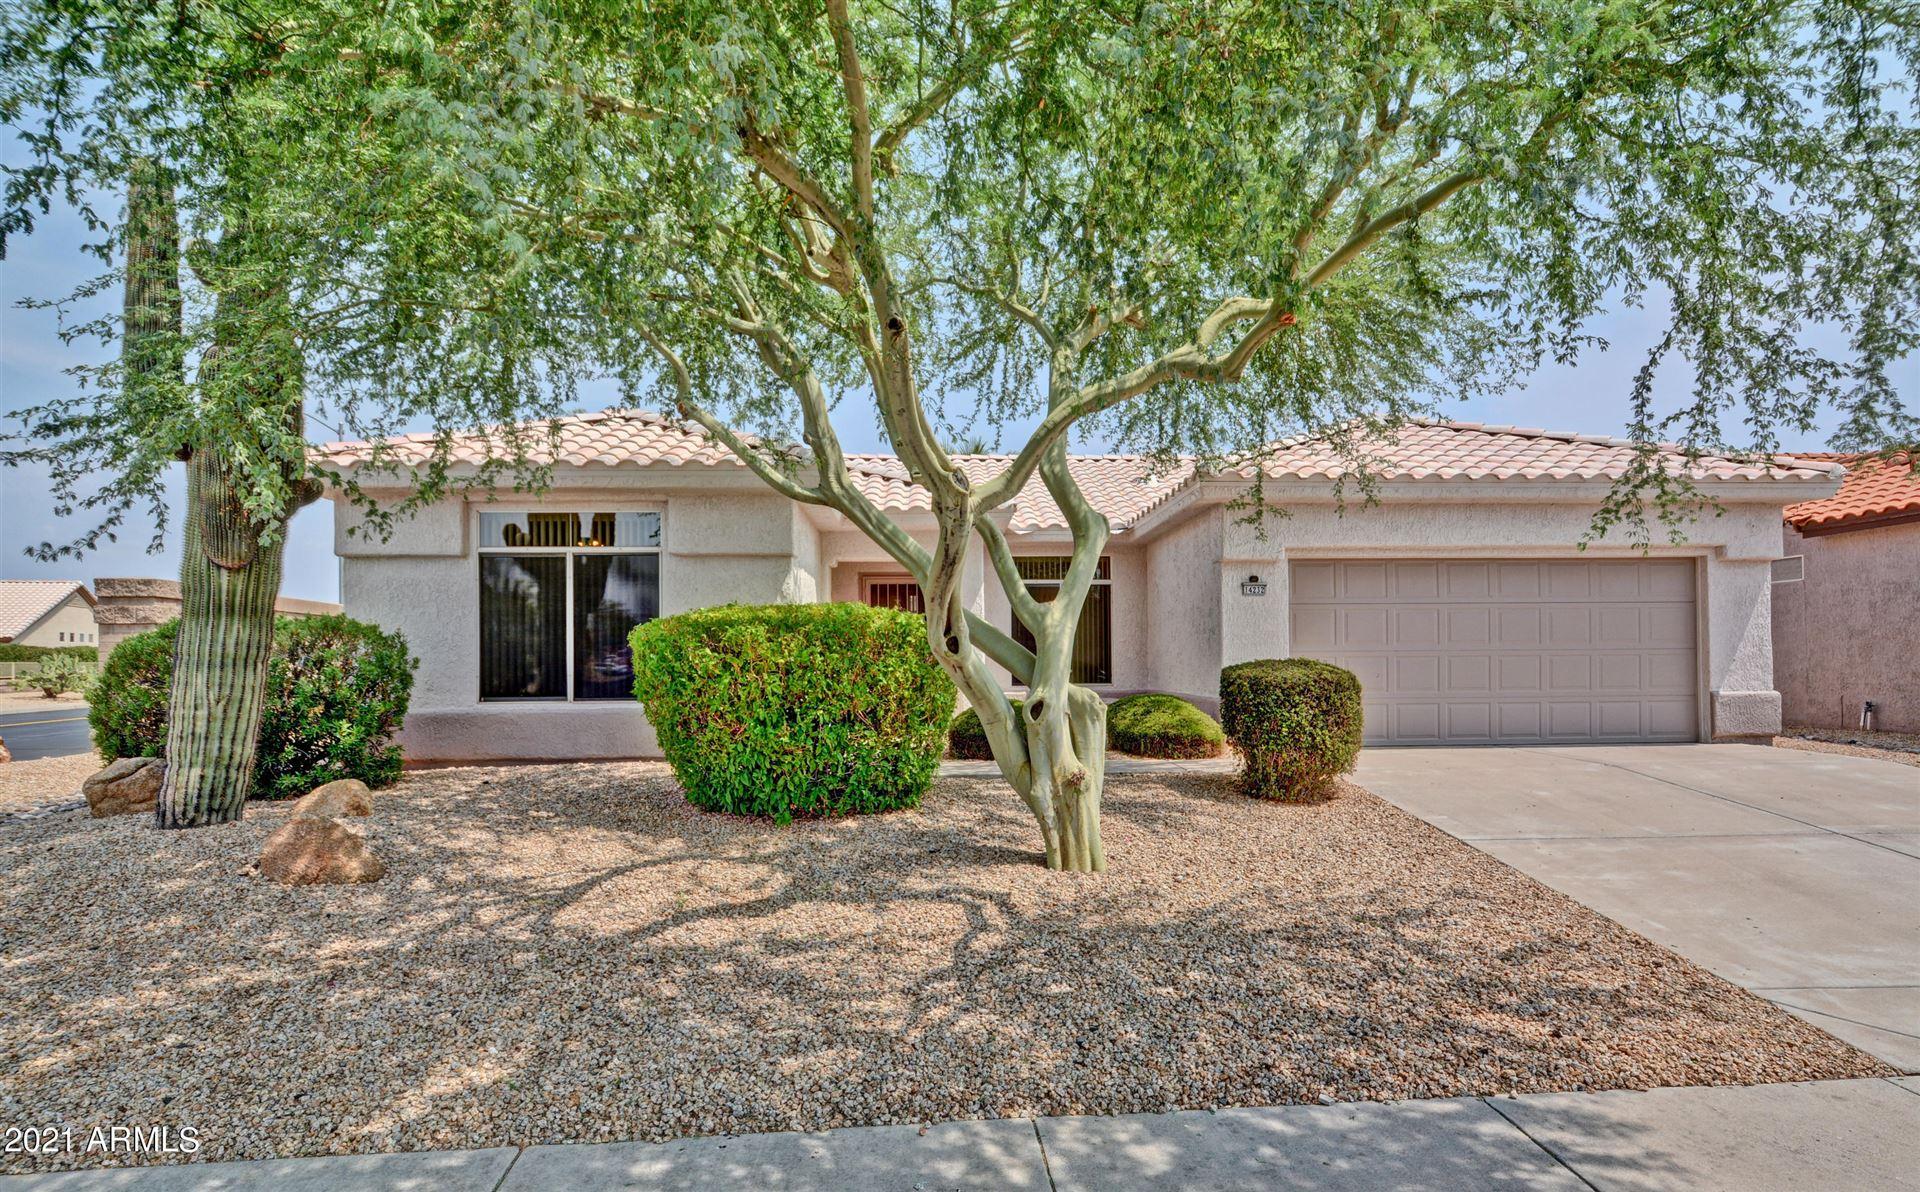 Photo of 14232 W GUNSIGHT Drive, Sun City West, AZ 85375 (MLS # 6272253)